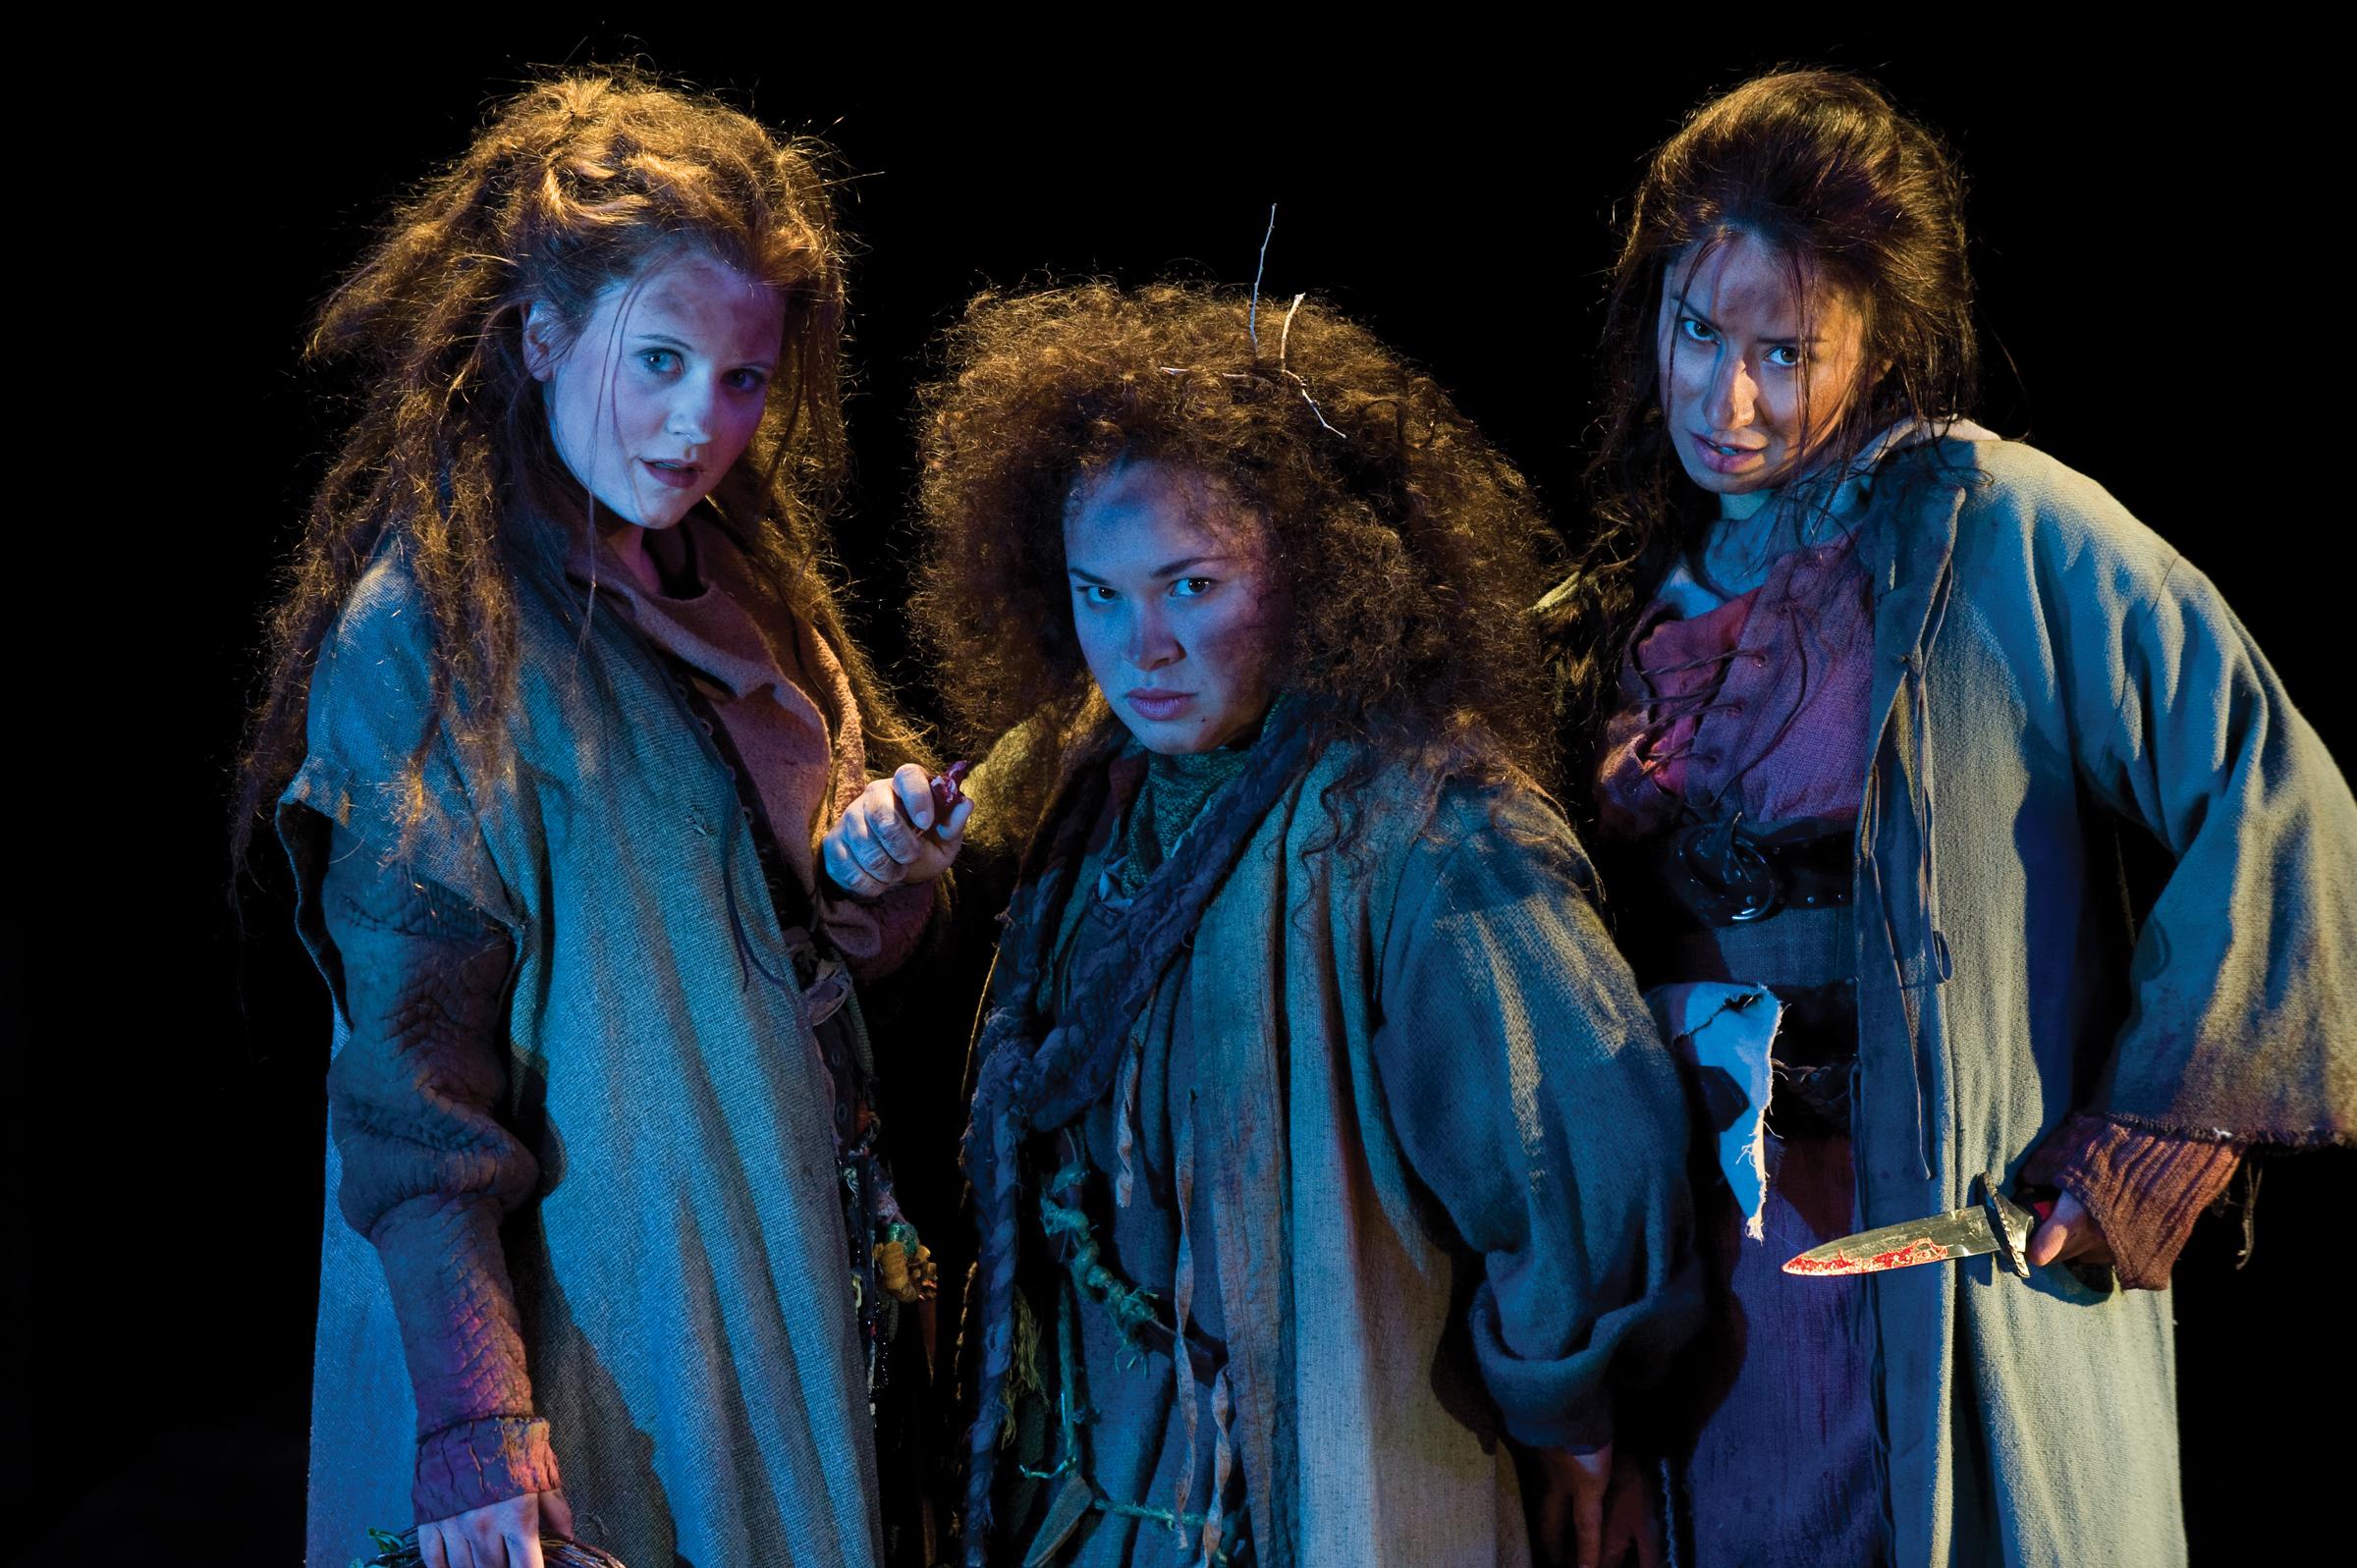 Chelsea Steverson (left), Lillian Castillo, and Monica Lopez as Weyward Sisters in  Macbeth, 2010. (Copyright Utah Shakespeare Festival. Photo by Karl Hugh.)